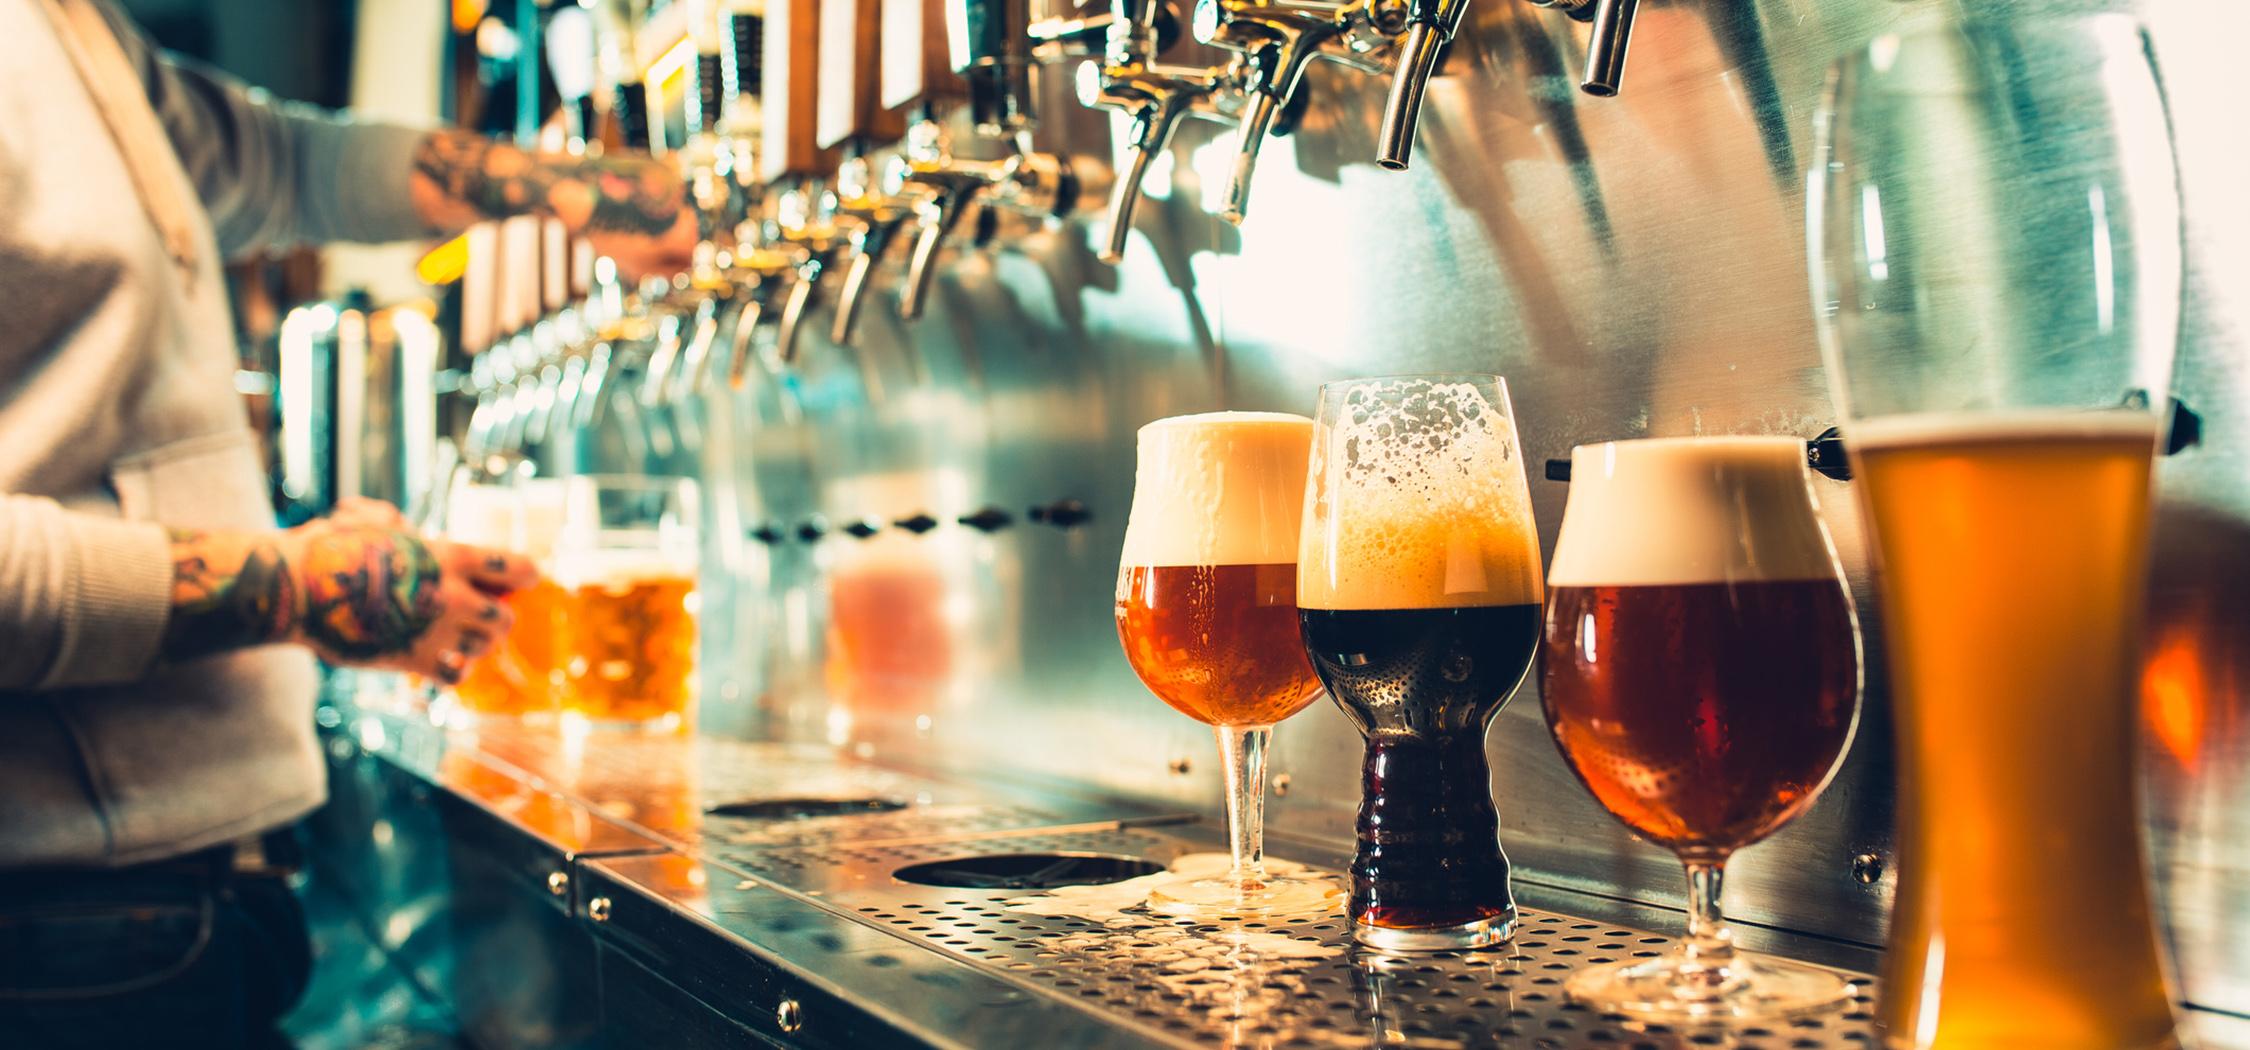 Brexit Beer Index - Beers being poured